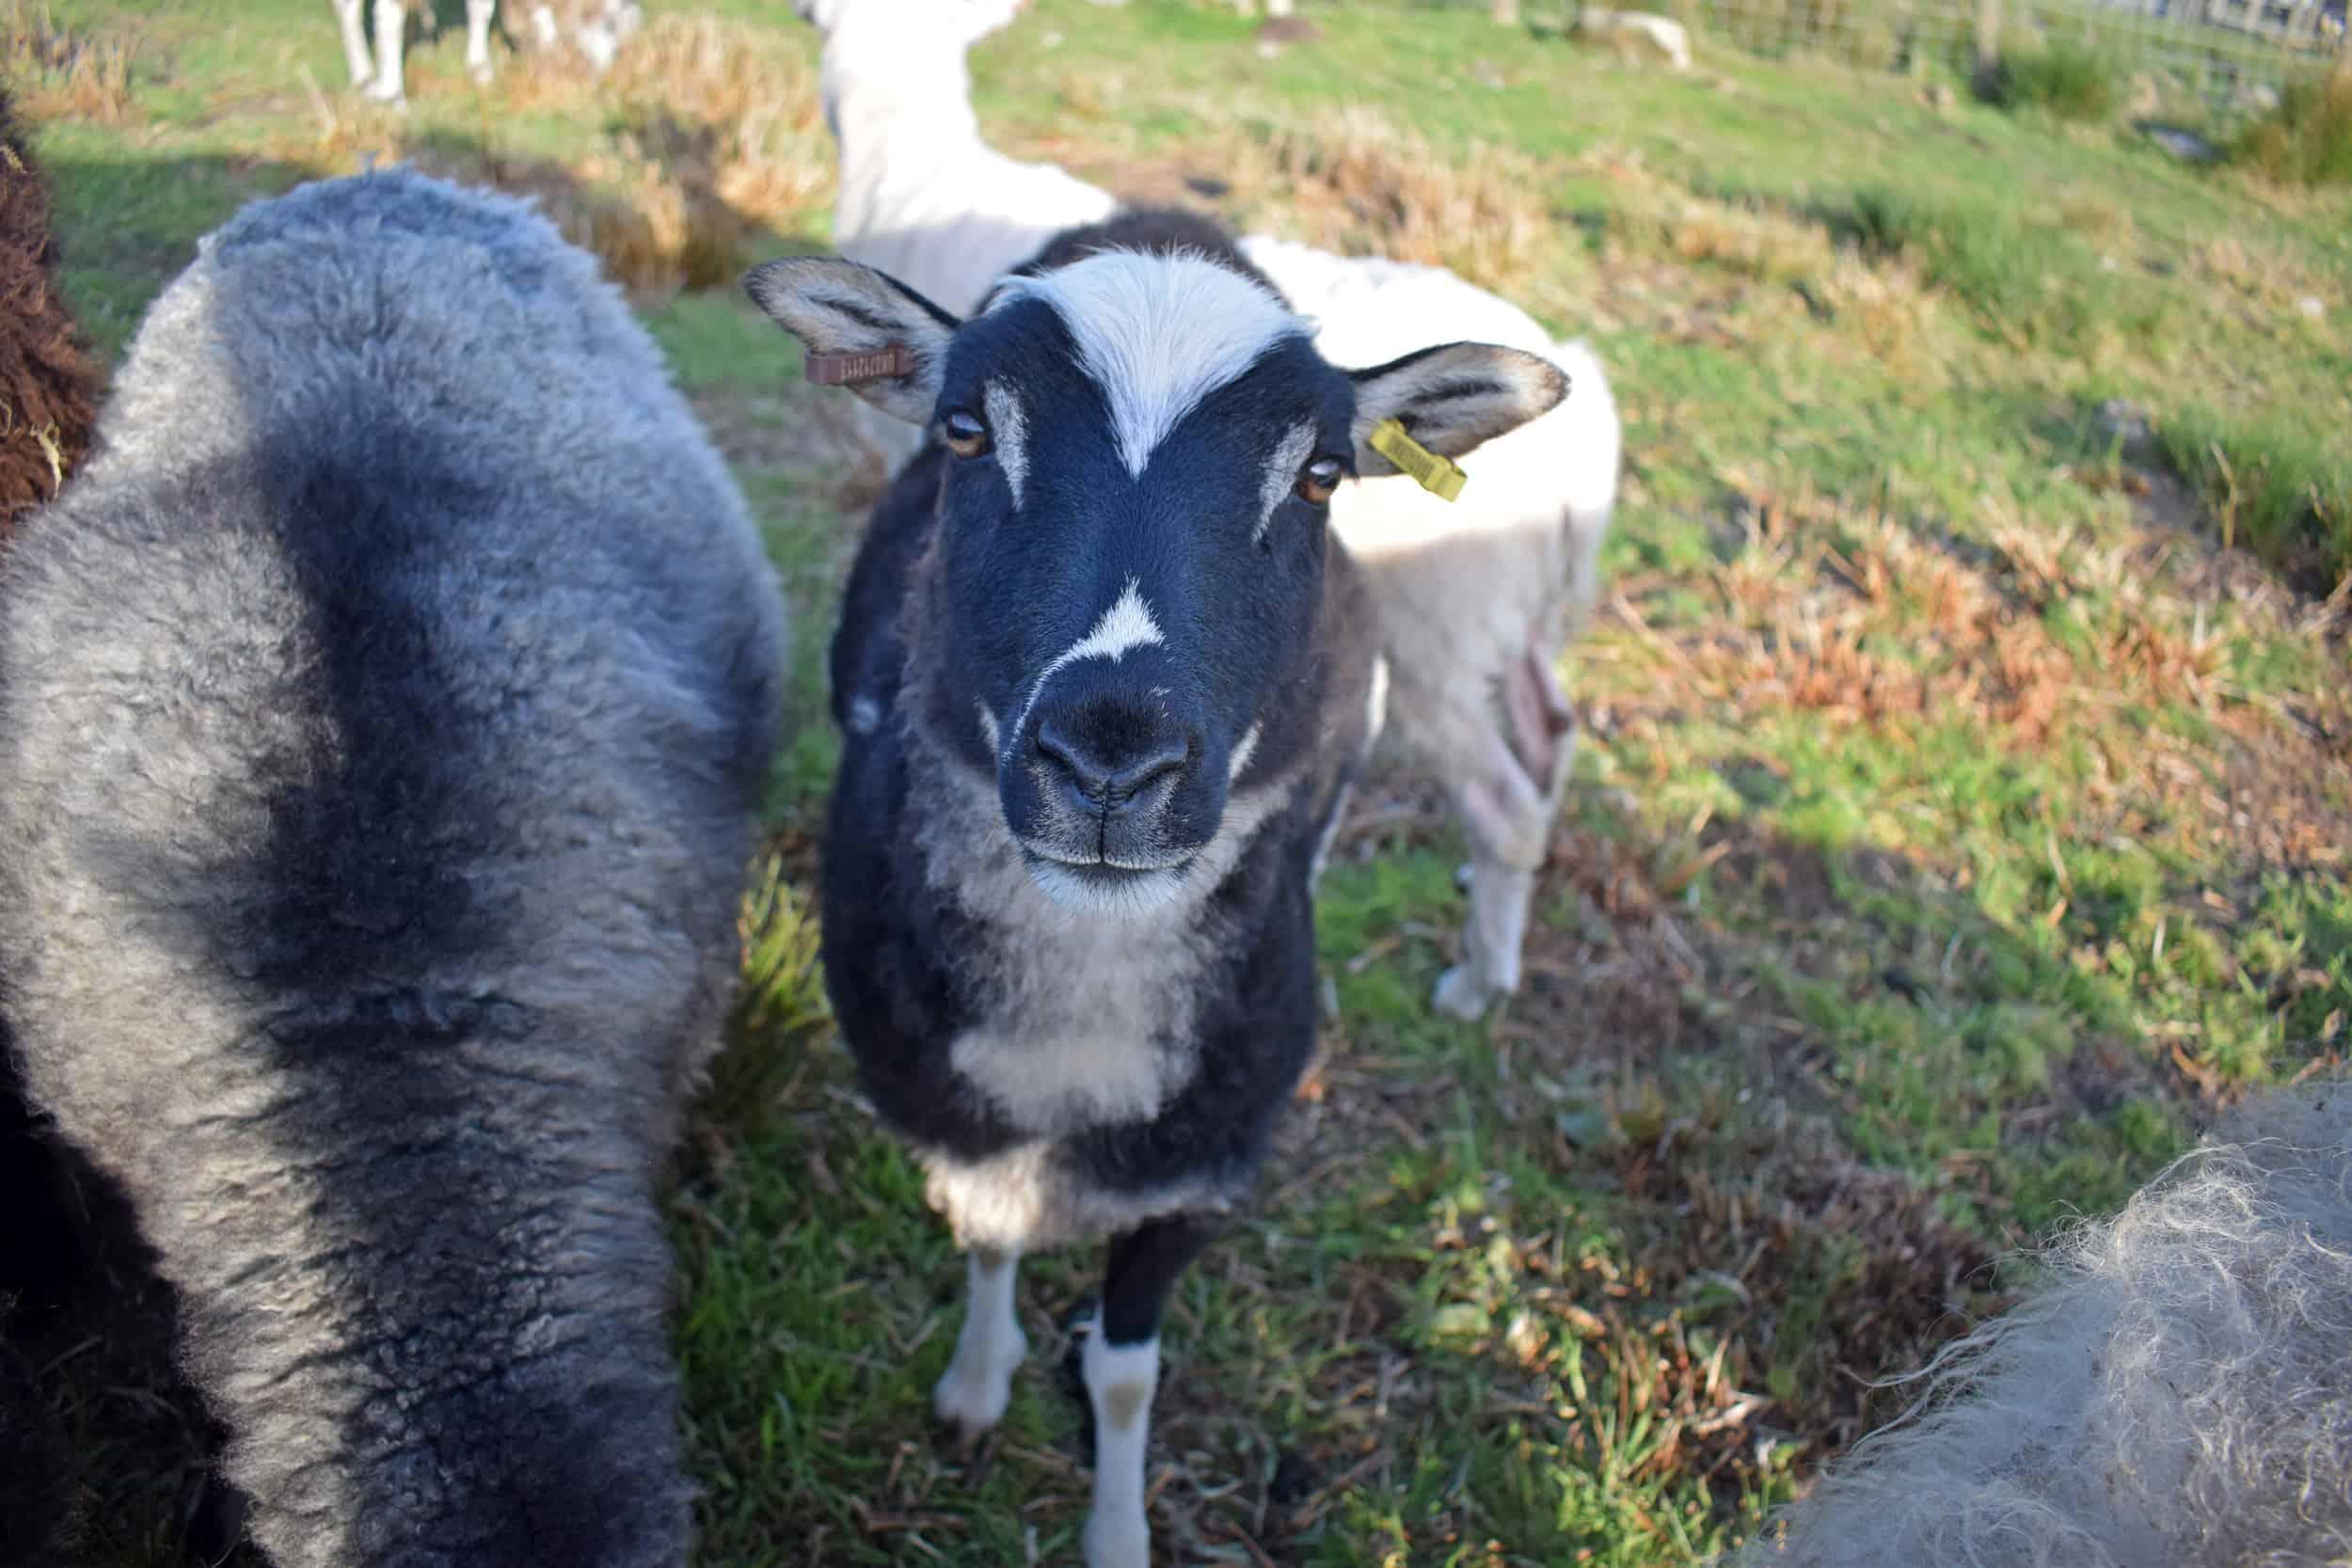 Lupin patchwork sheep icelandic cross soay jacob black mouflon beautiful natural 5